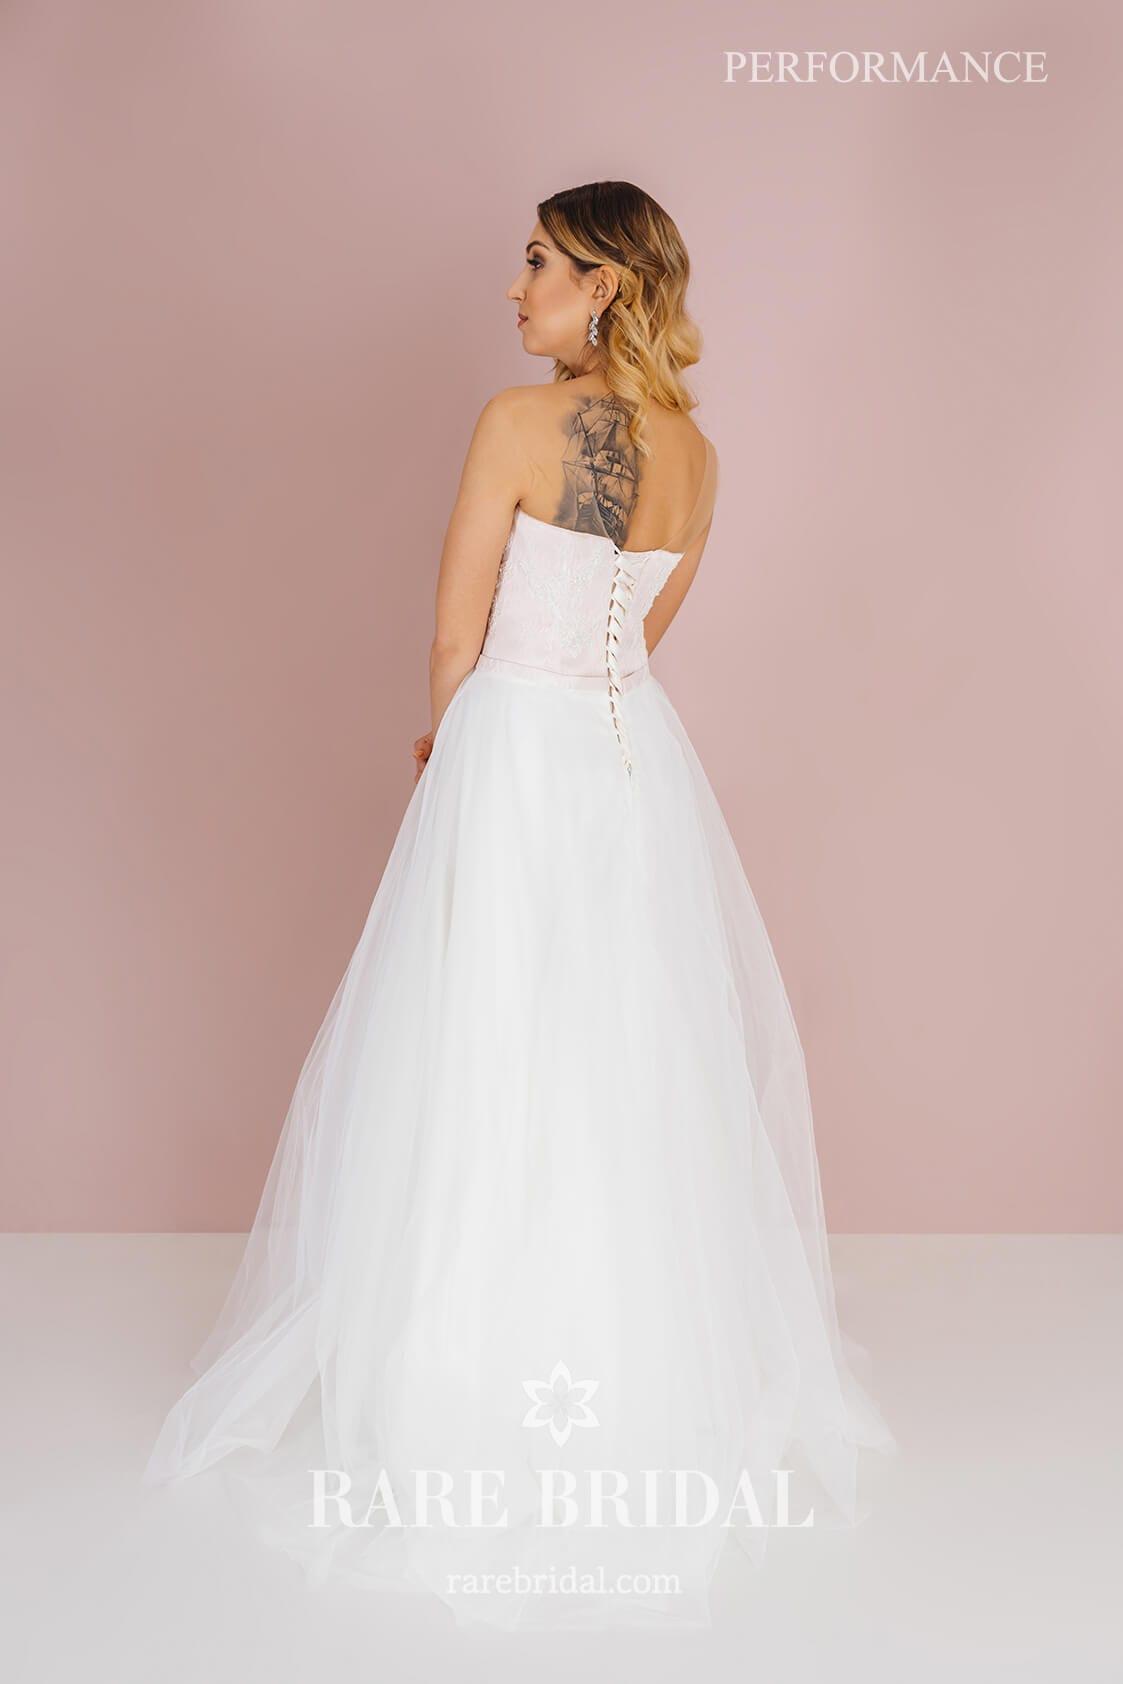 Свадебное платье PERFOMANCE, коллекция LOFT, бренд RARE BRIDAL, фото 3